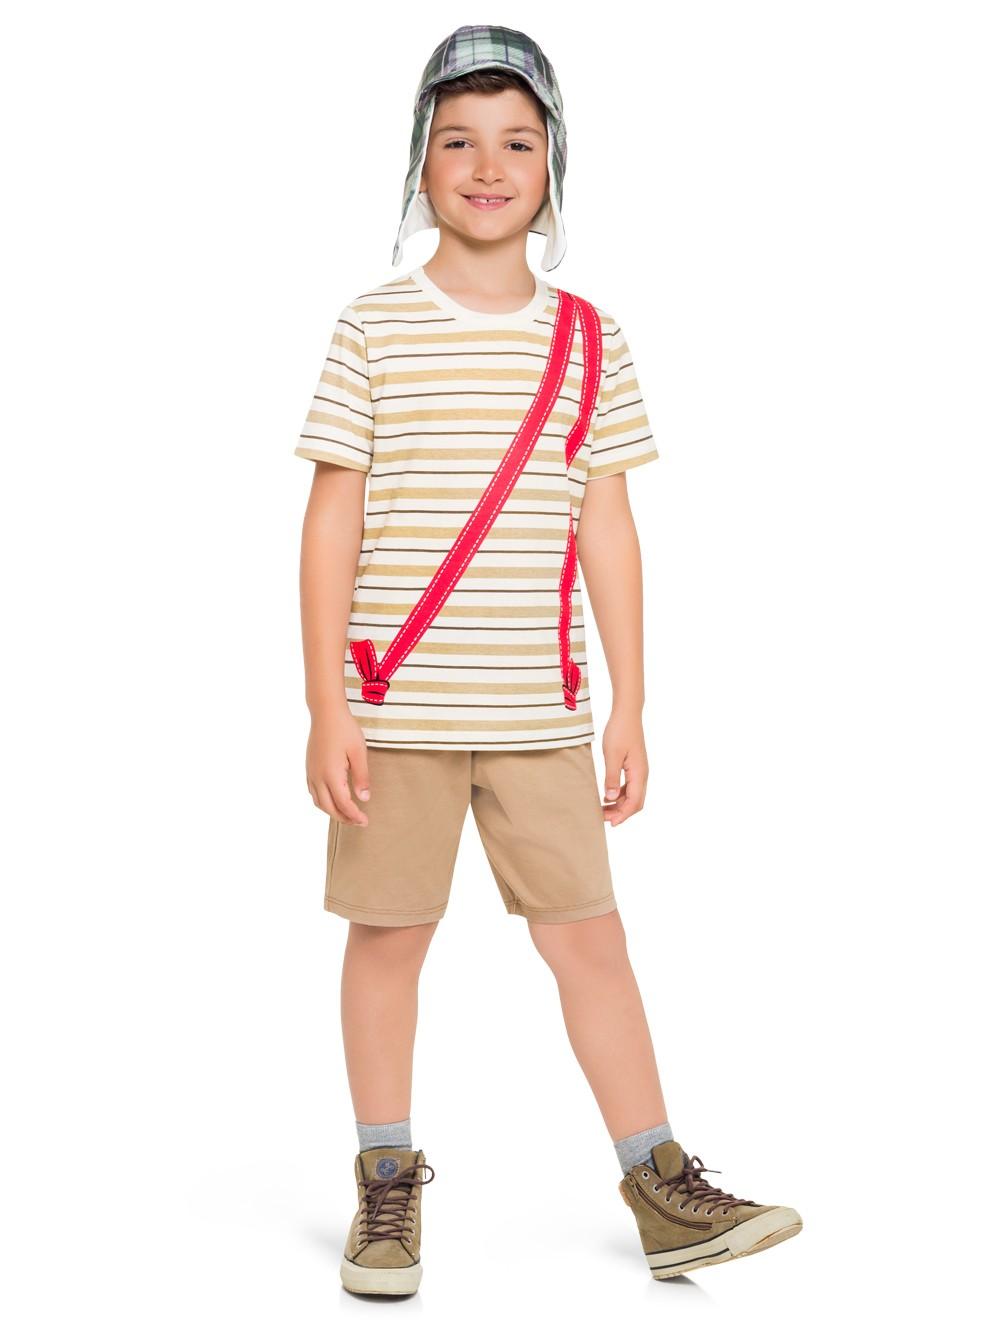 Pijama manga curta infantil chaves menino brinde chapeu